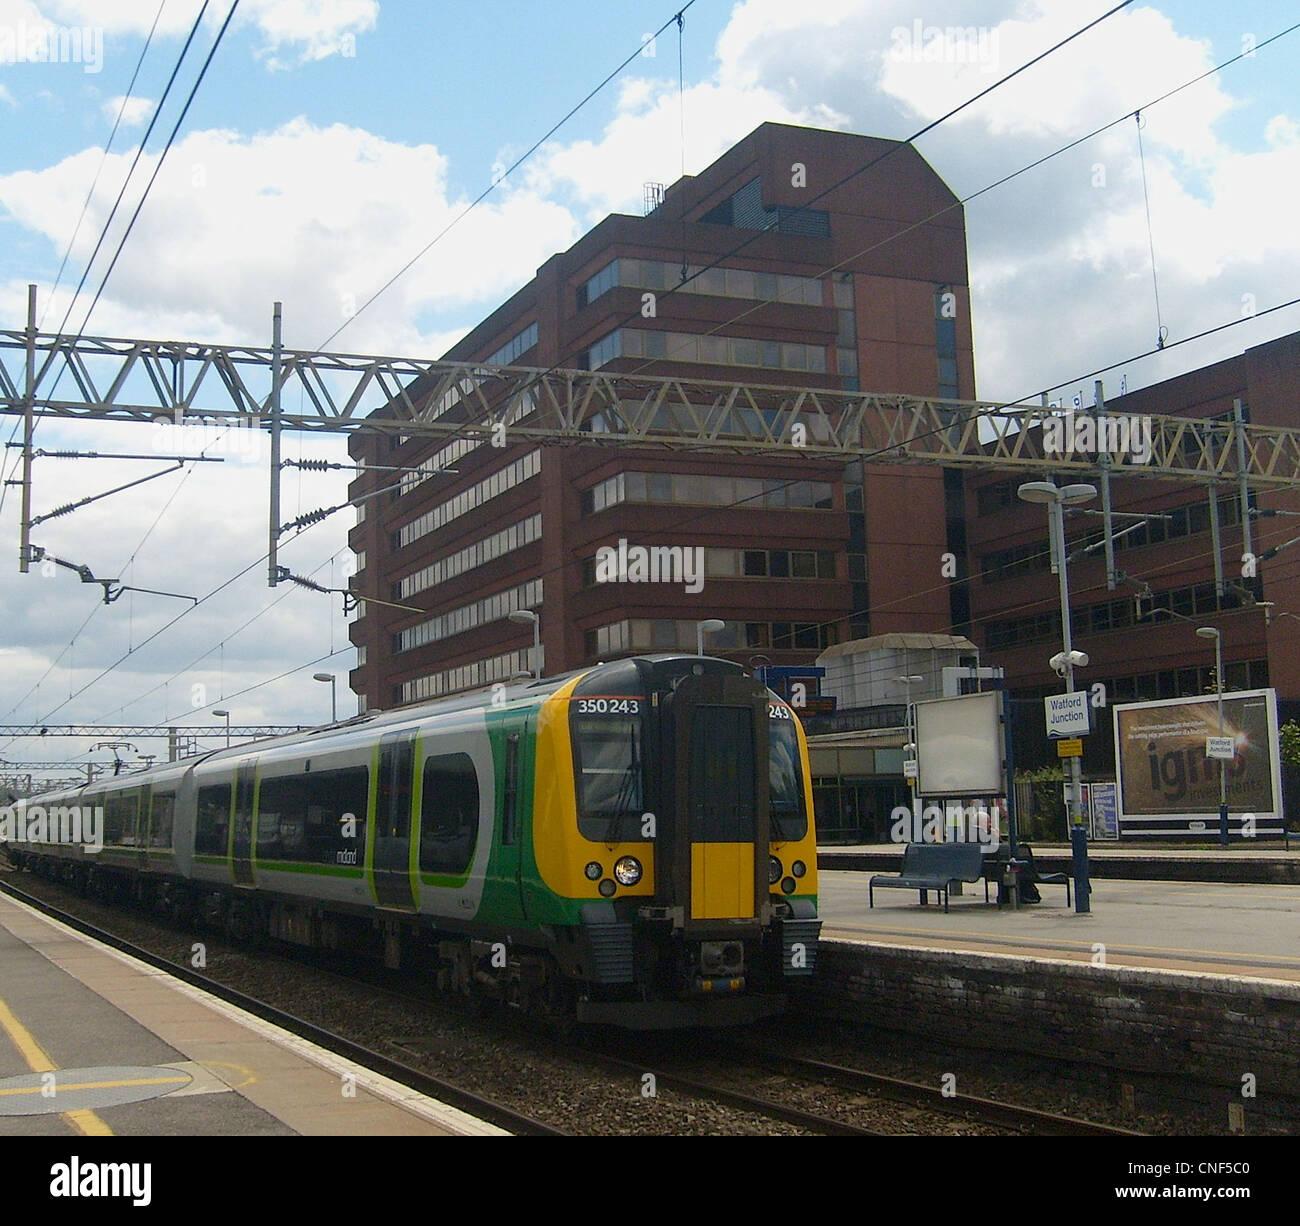 London Midland Class 350/2 Desiro No. 350243 at Watford Junction. - Stock Image